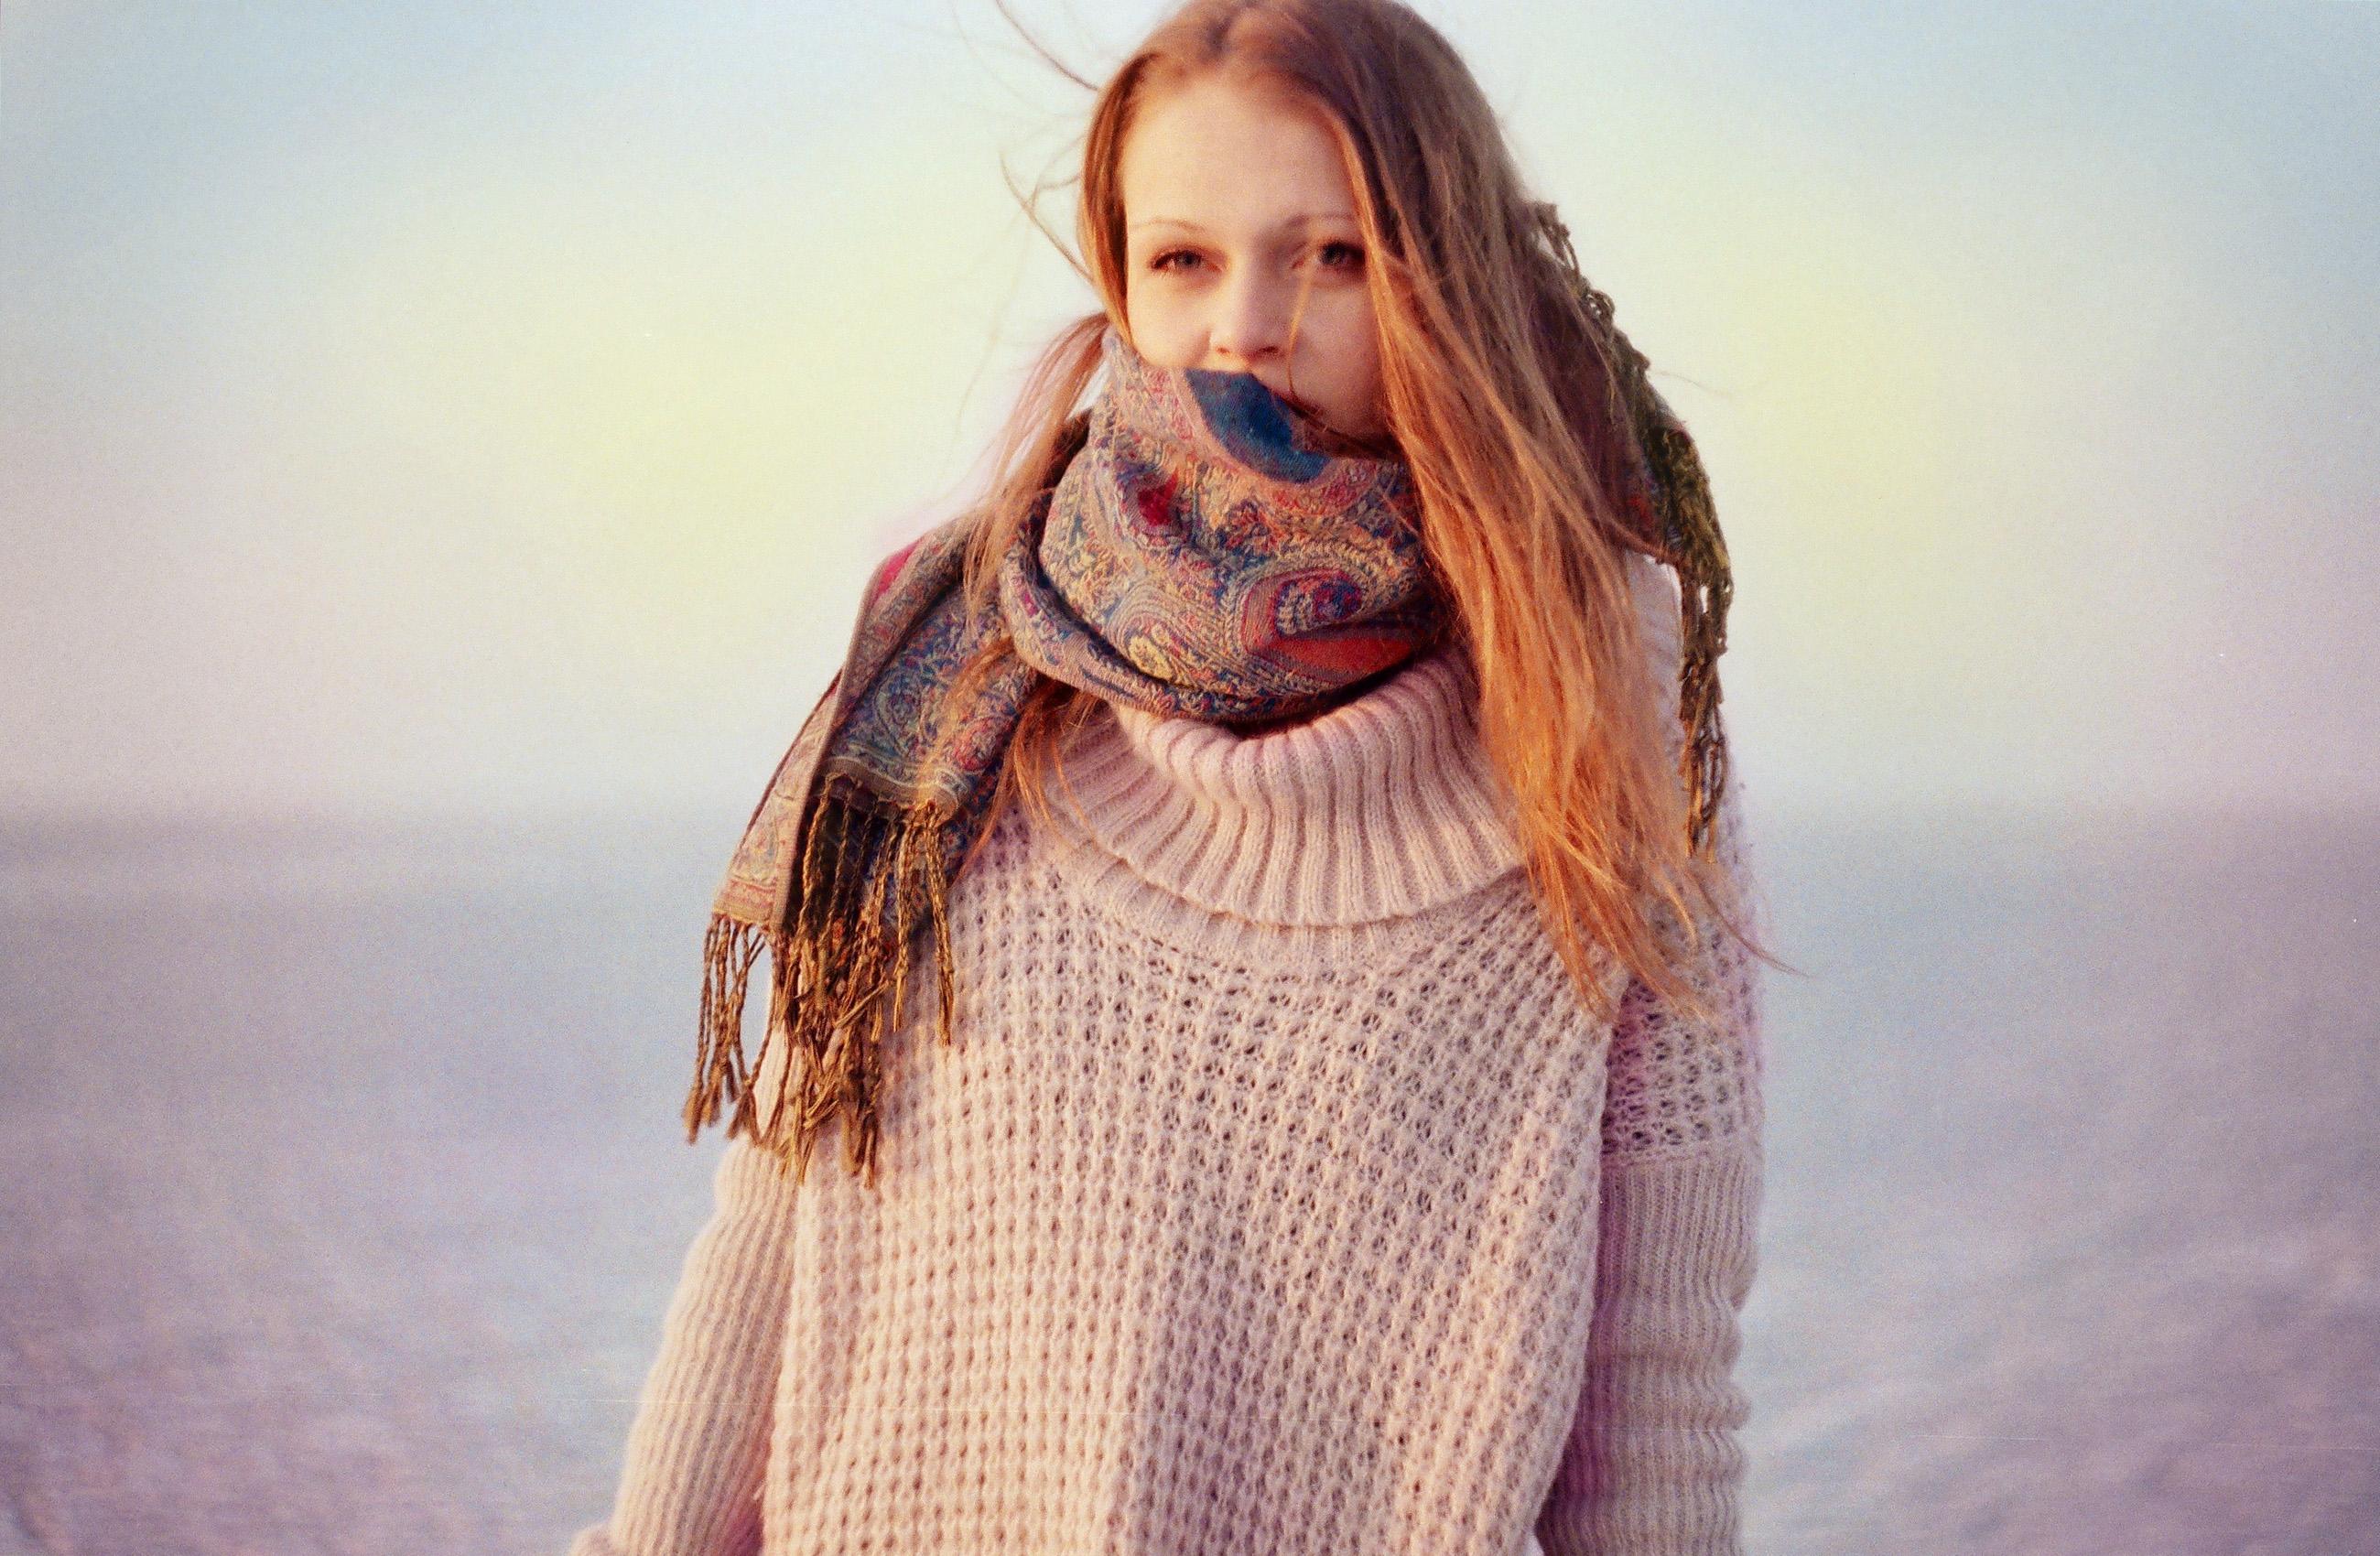 Foto: Girl av Mitya Ku, CC-SA.